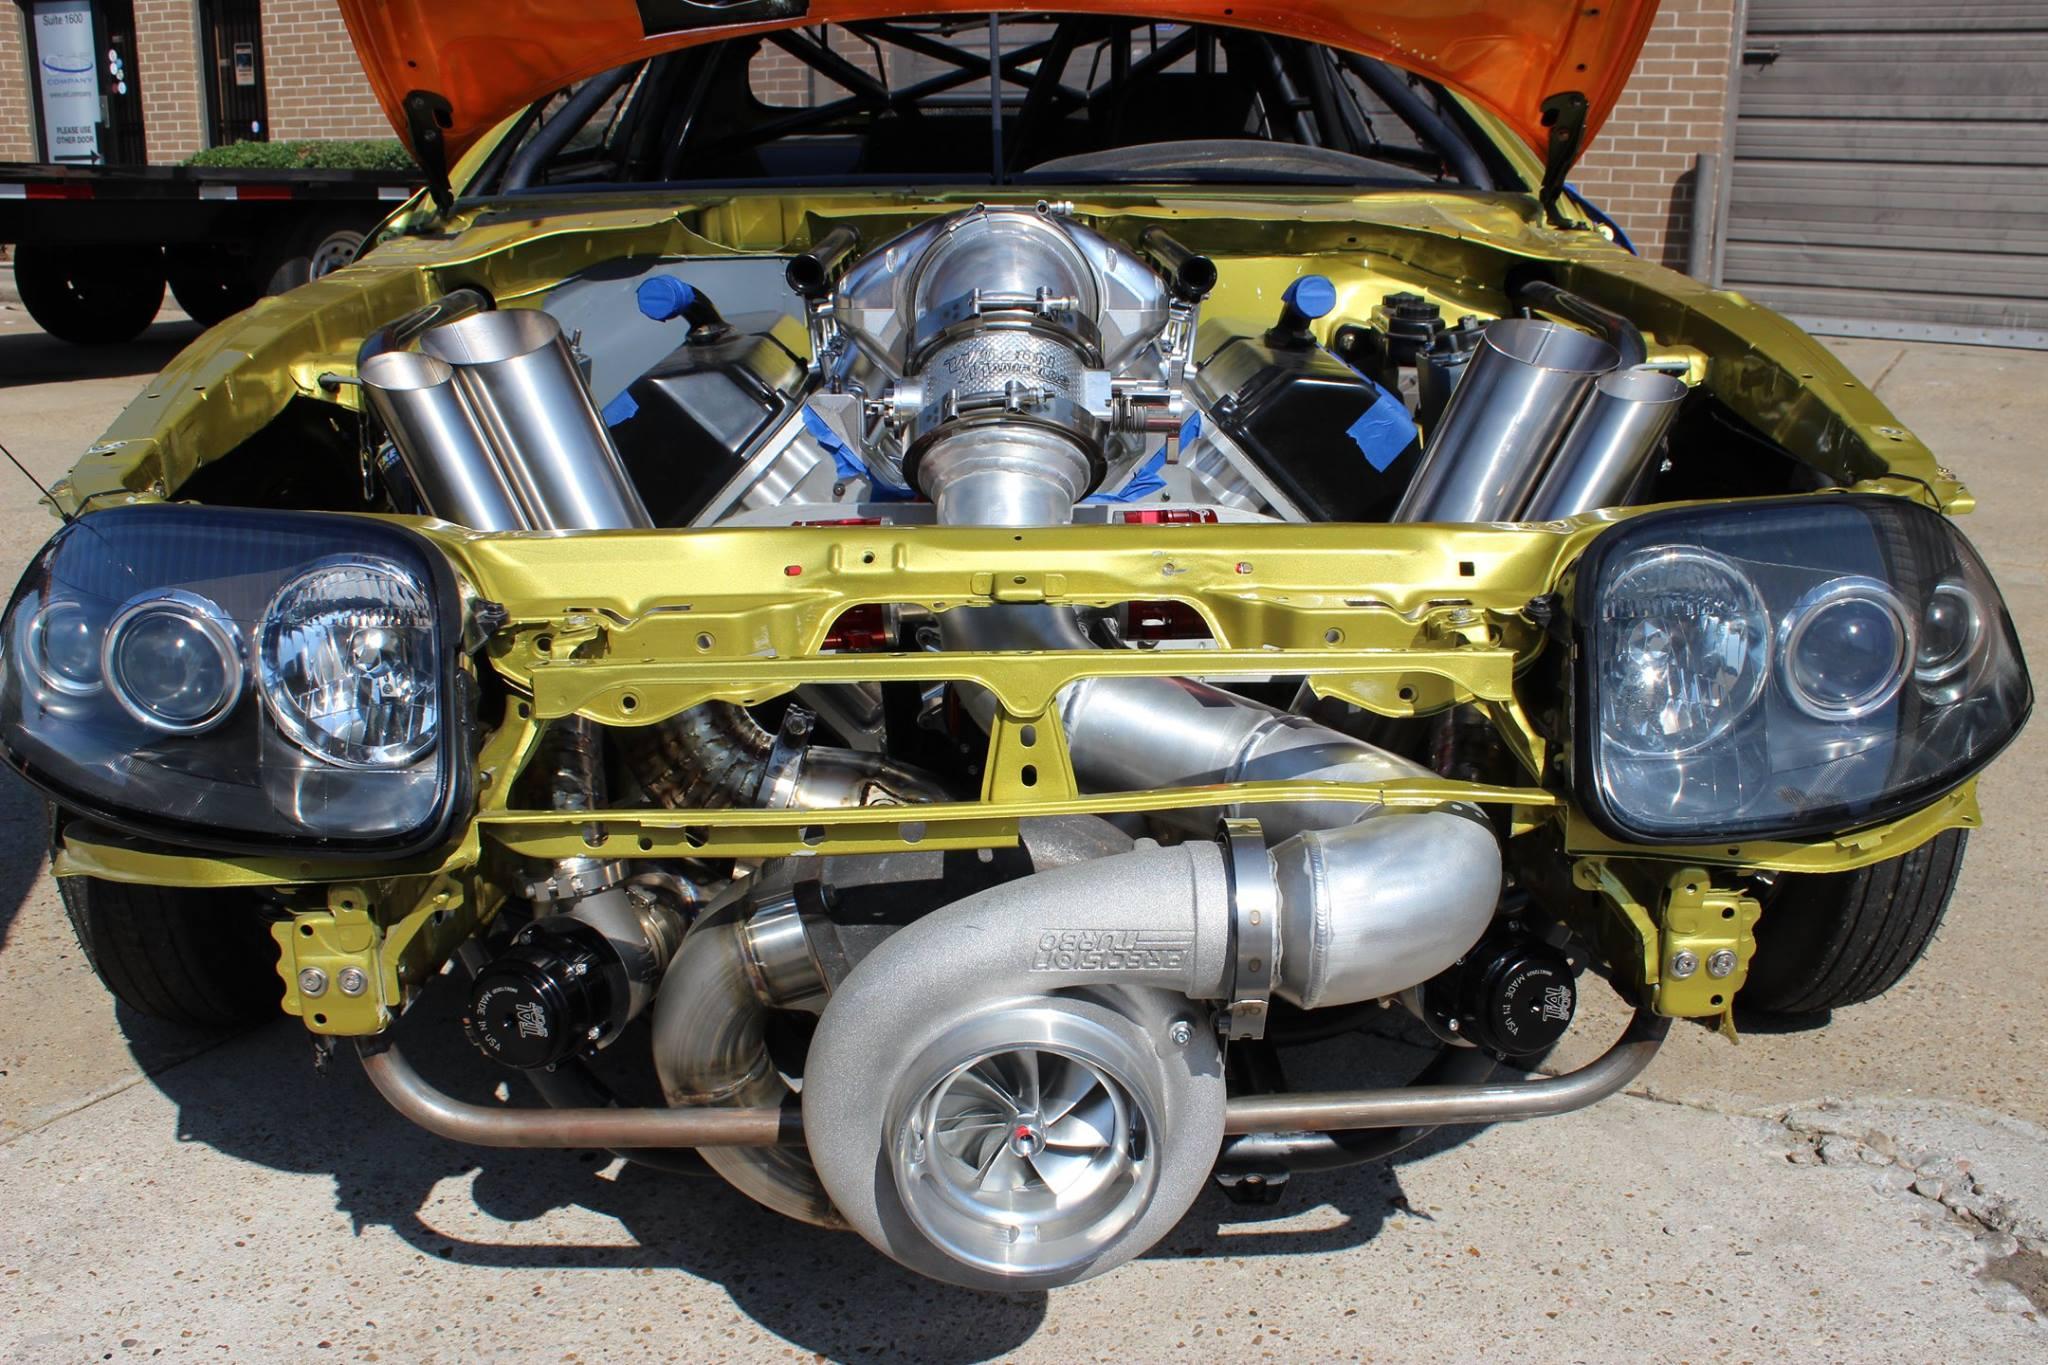 Toyota Supra With A Turbo Hemi V8 Engine Swap Depot